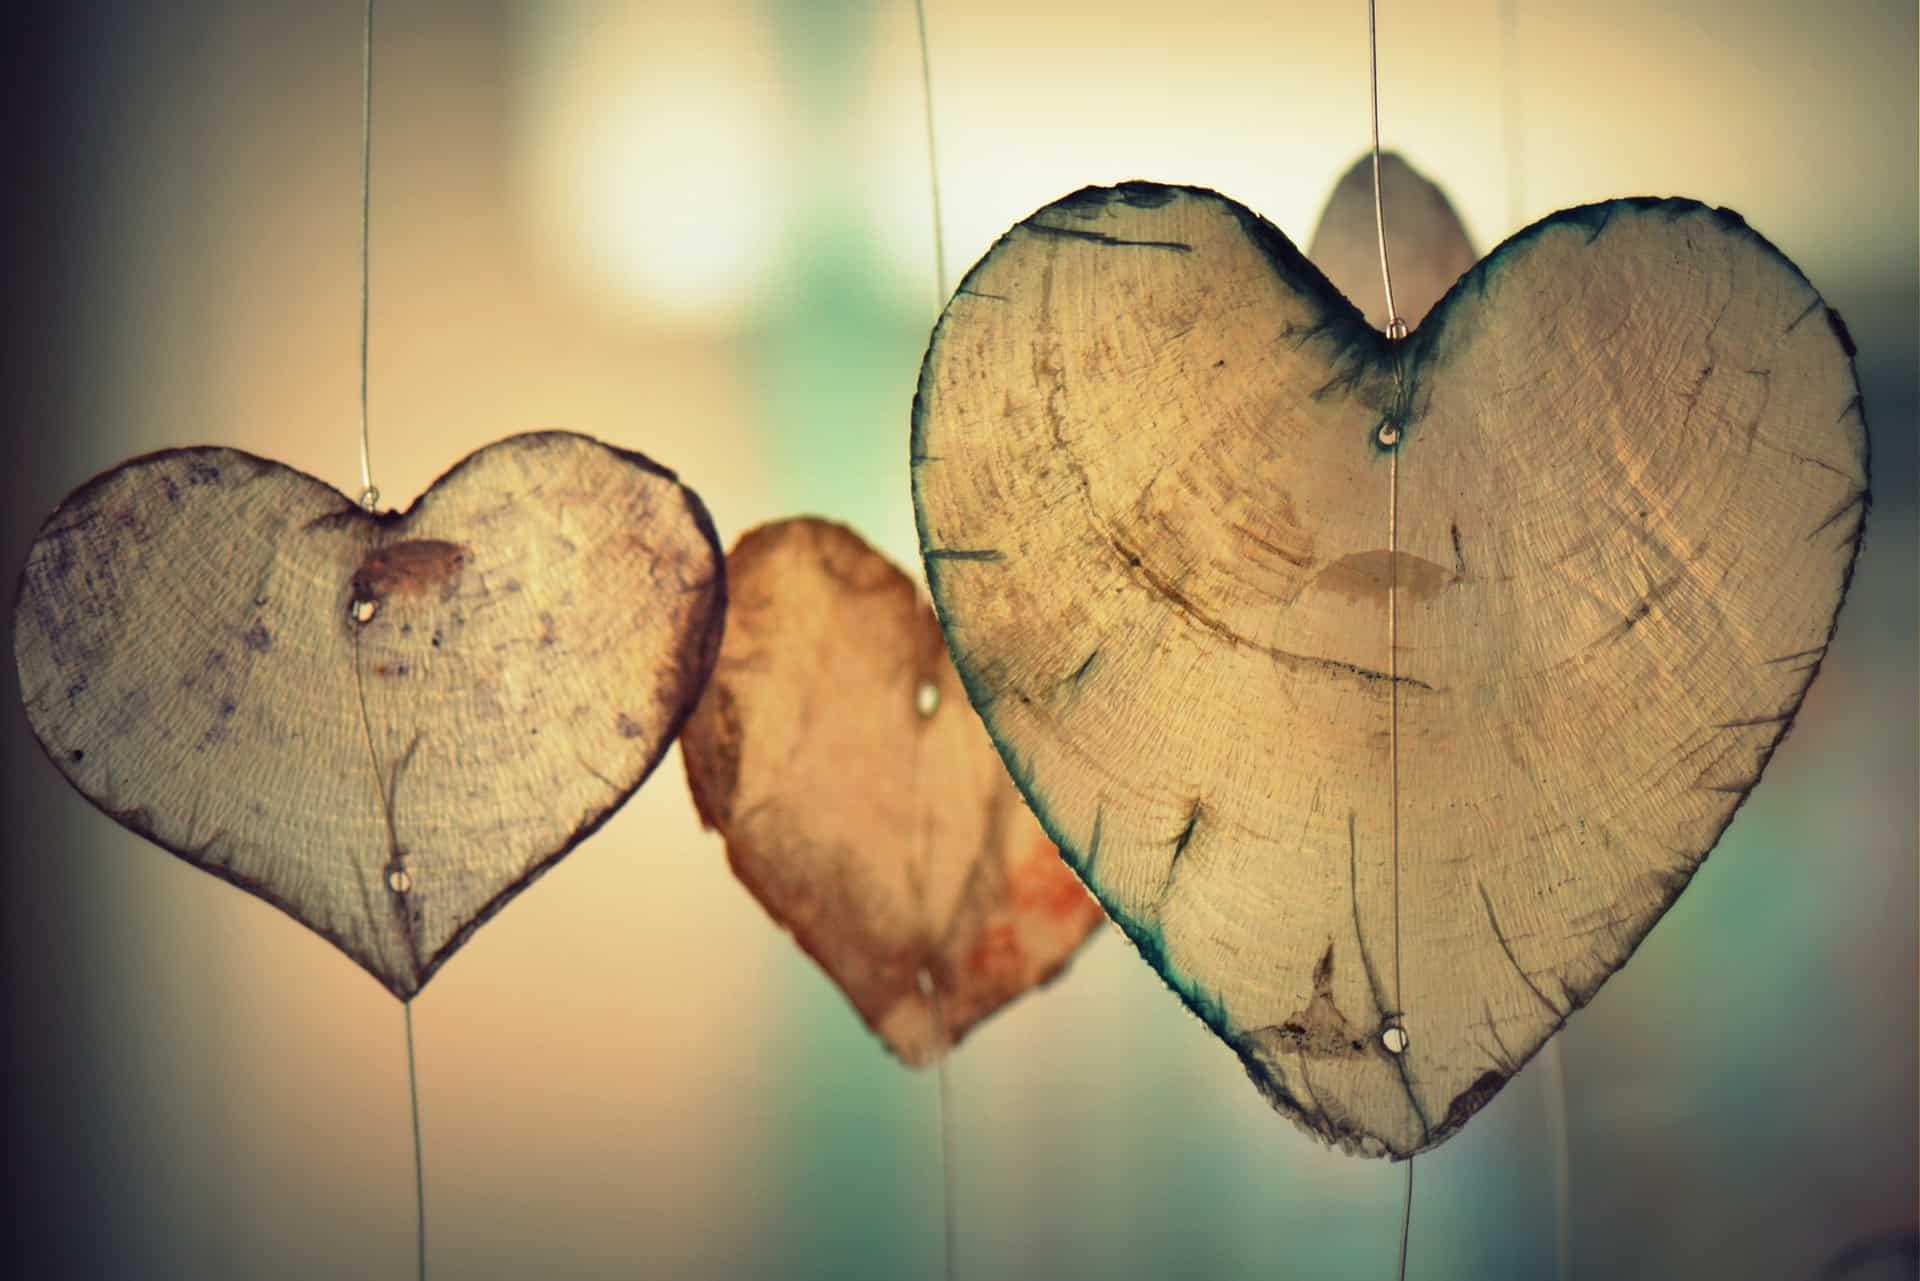 Choosing love over fear as a birthworker